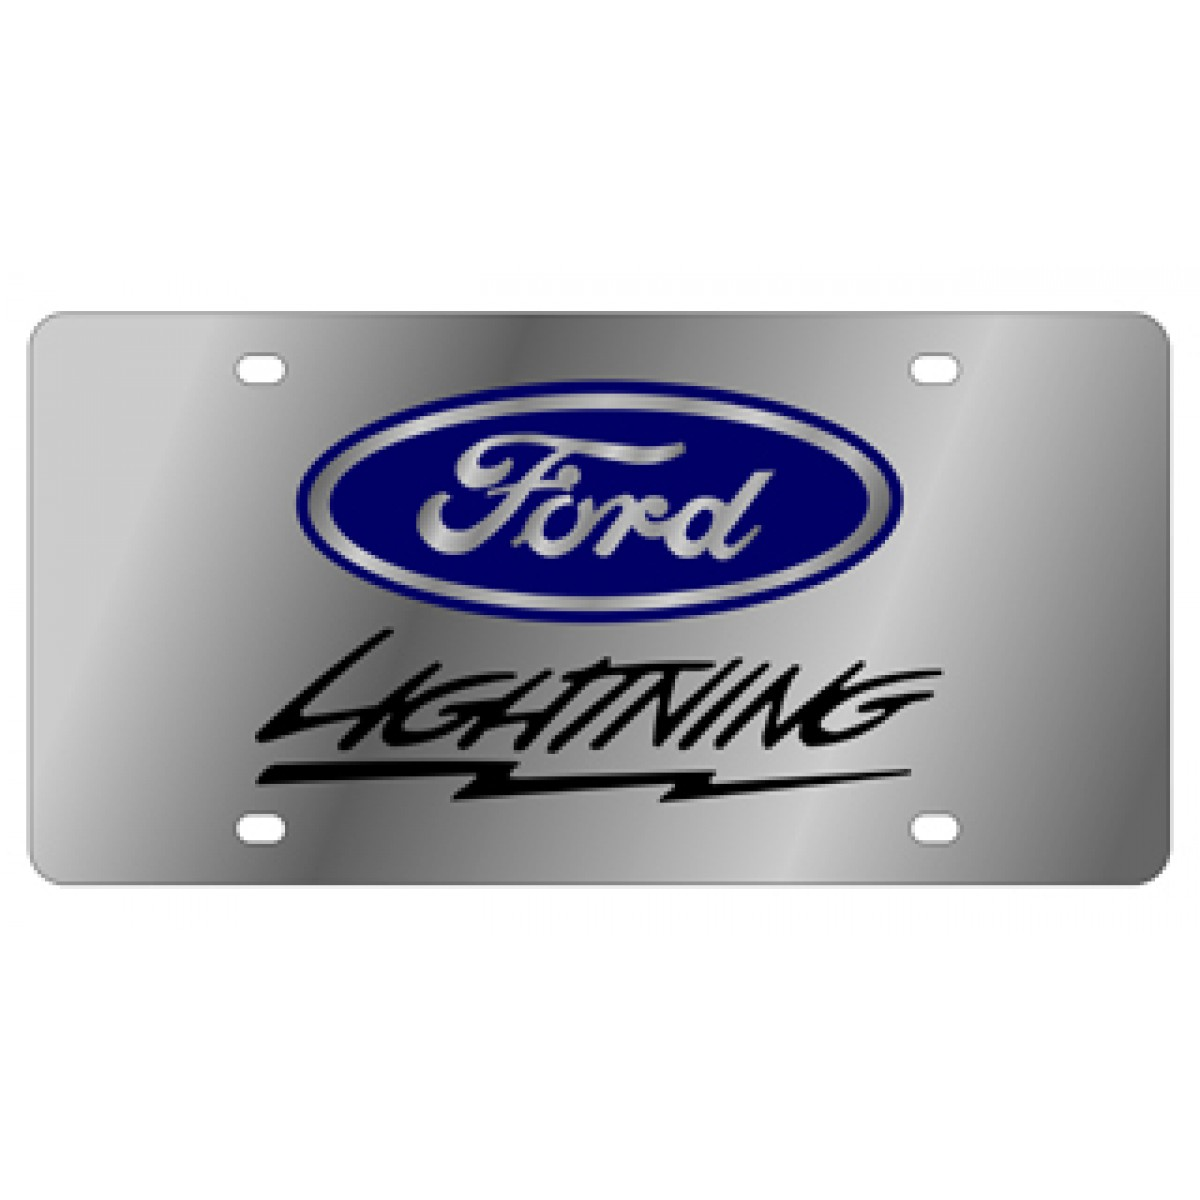 HossRods com | Ford Lightning License Plate - Lazer Style